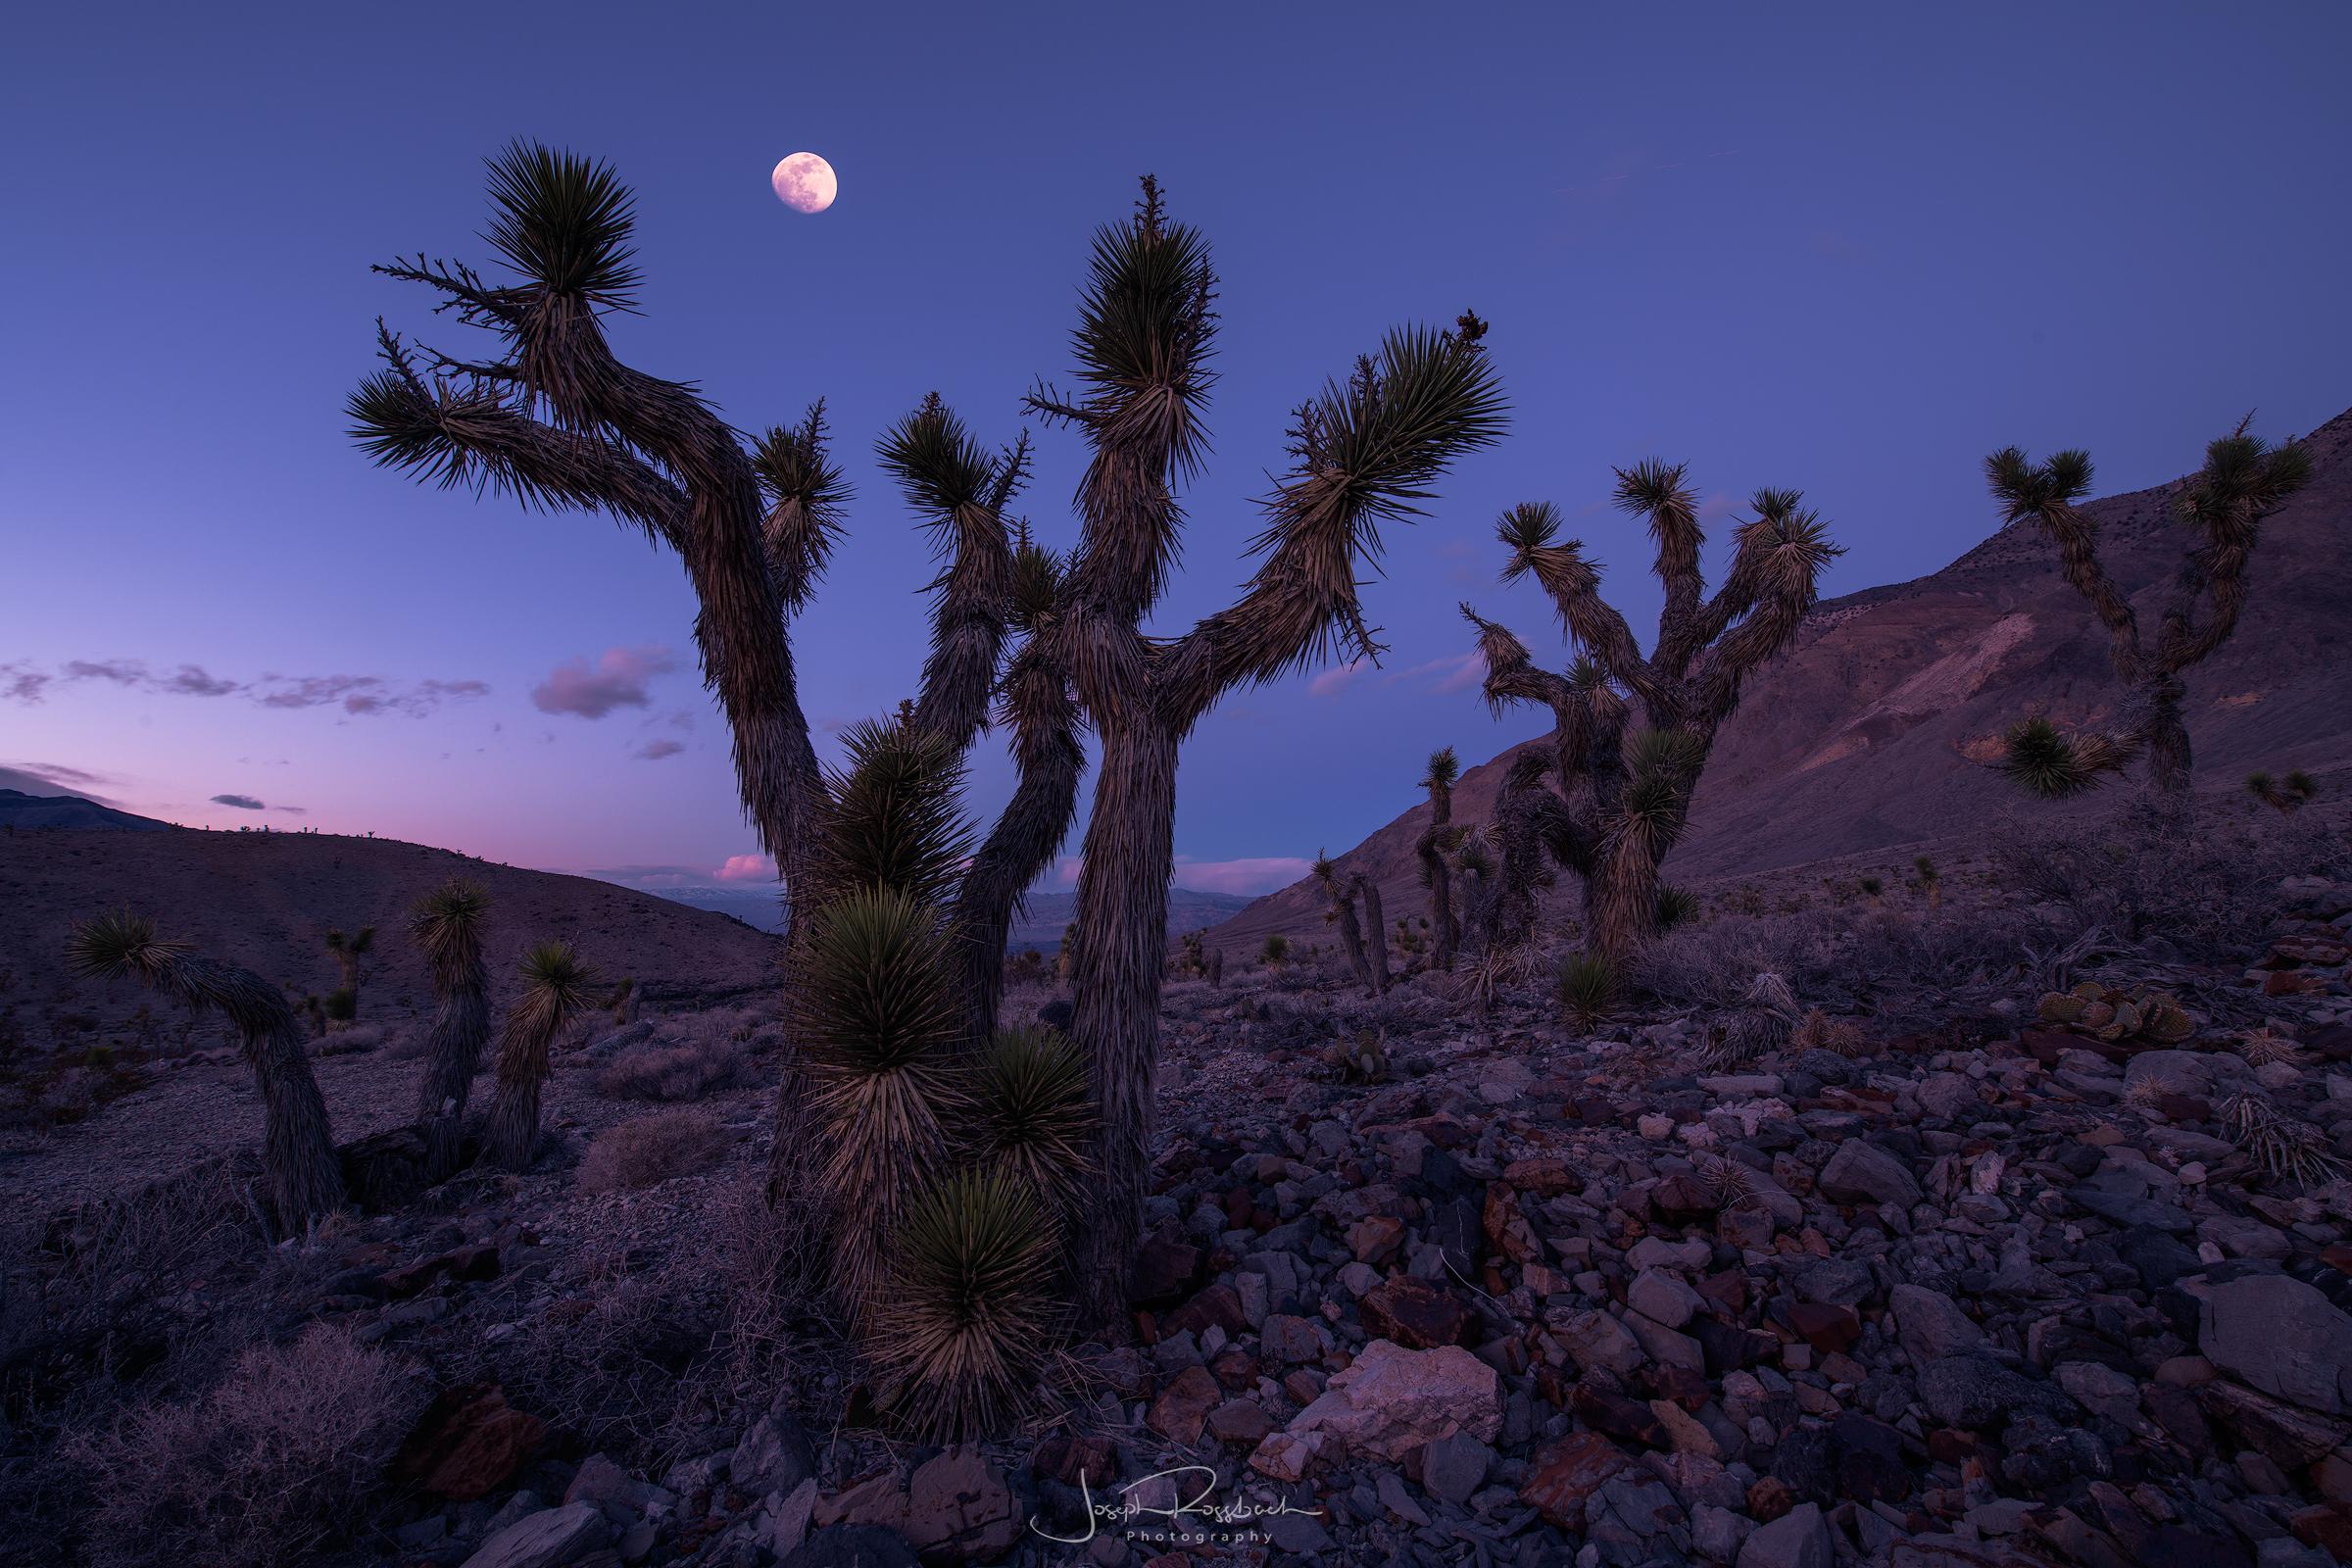 Moonrise above Joshua Trees, Death Valley National Park, California